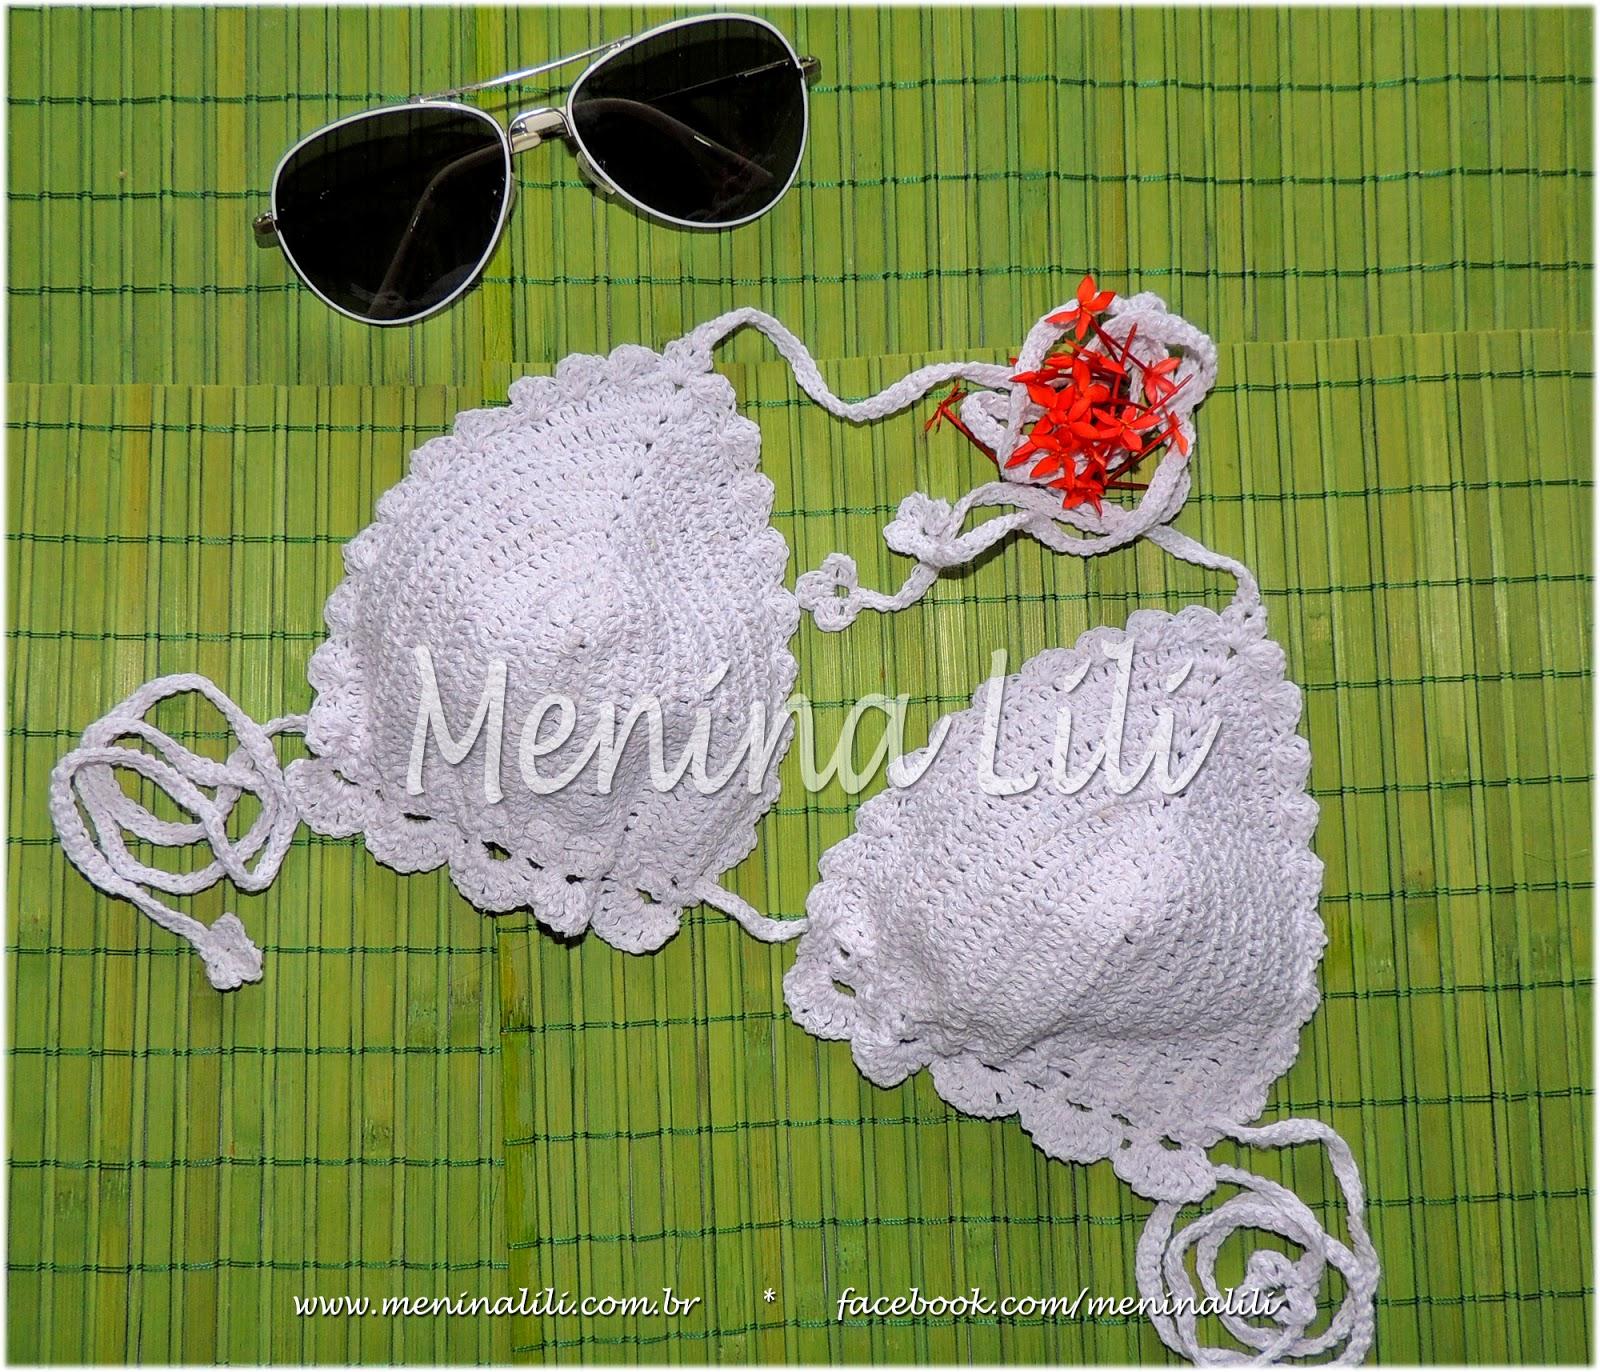 251a6f25b Menina Lili Croche: Biquini de Crochê (parte de cima) Branco